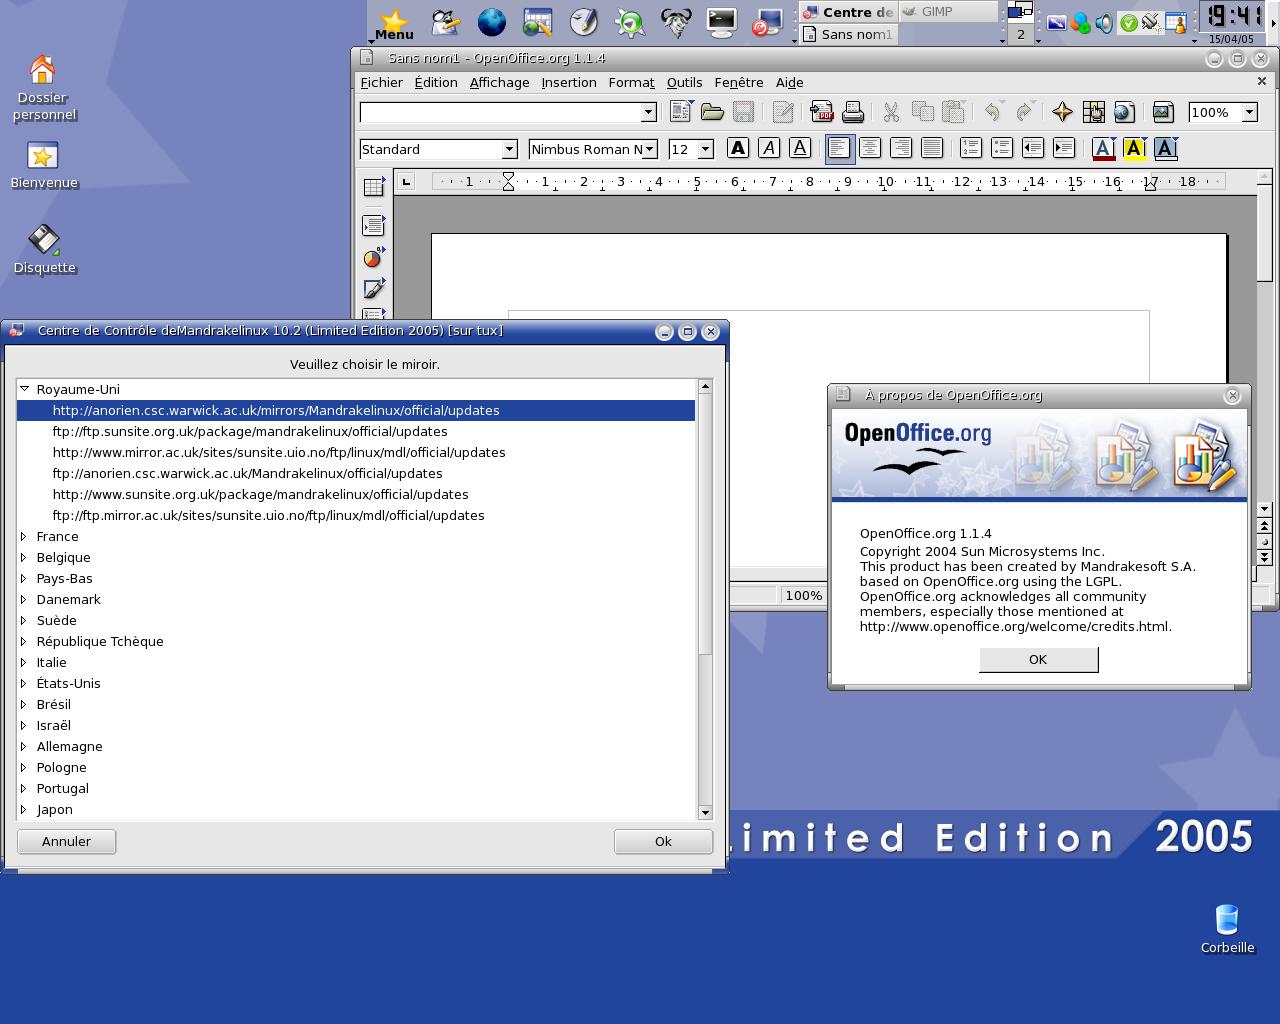 Mandrake Linux 2005 Limited Edition Mandriva10-2_02